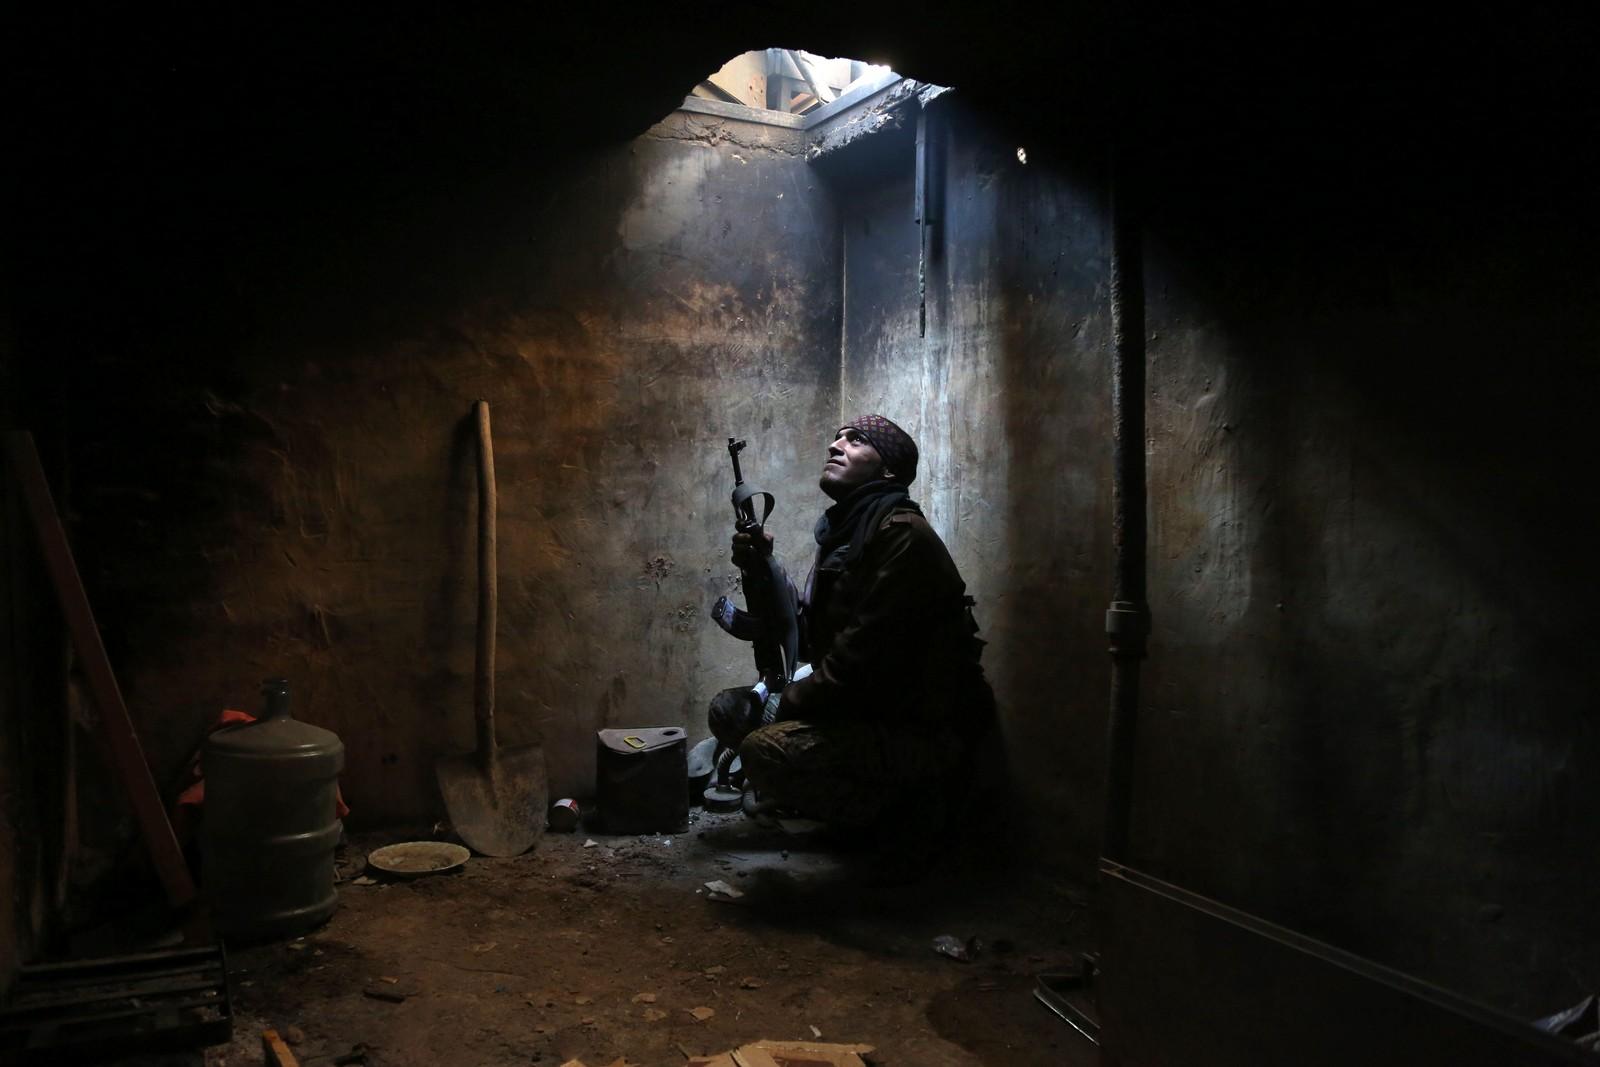 Et medlem visstnok tilhørende Faylaq al-Rahman-brigaden, foreviges fra sitt gjemmested i Arbeen utenfor den syriske hovedstaden Damaskus.